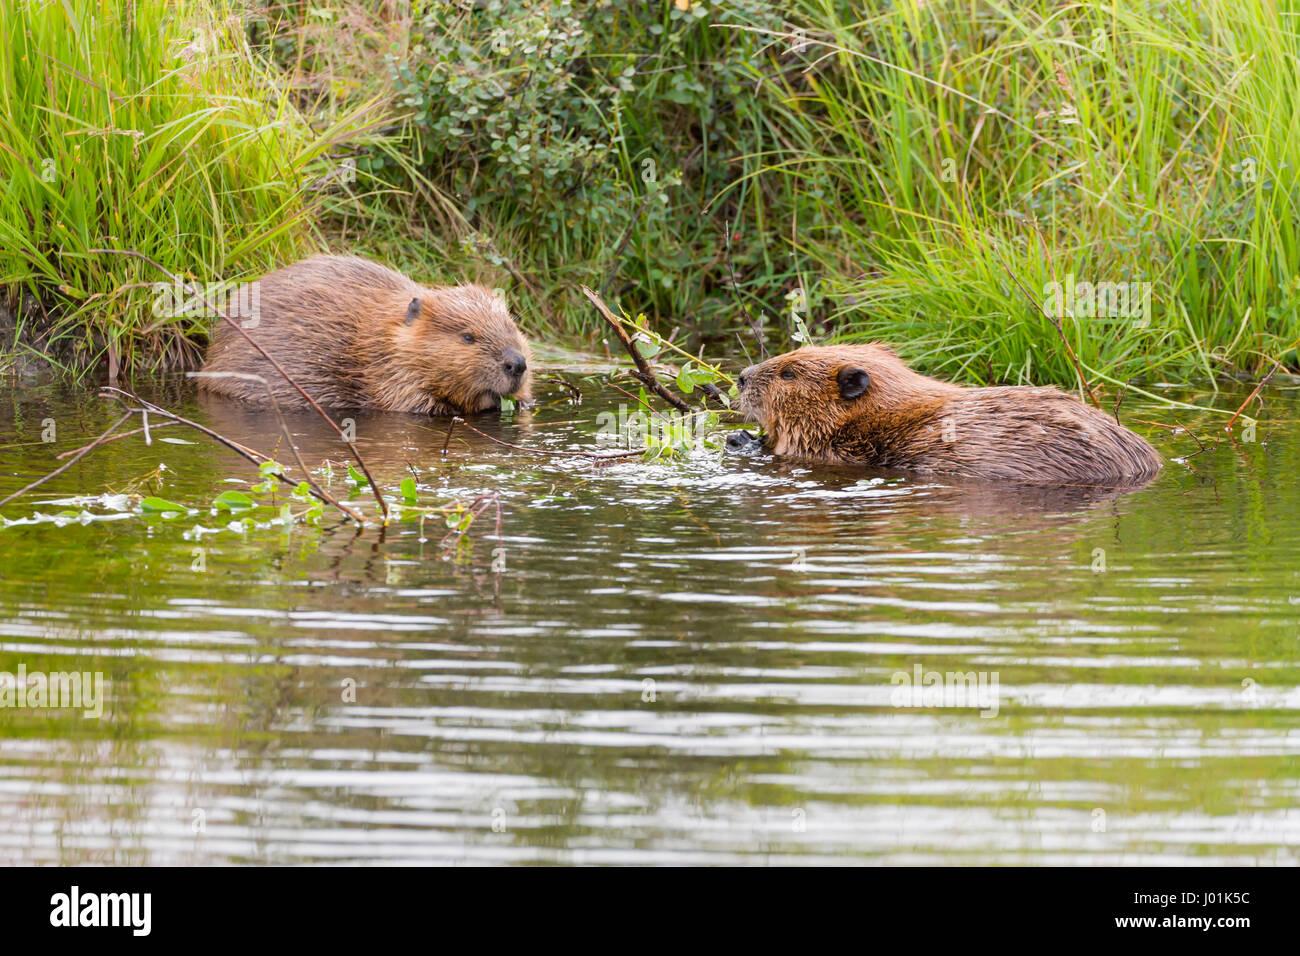 American Beaver (Castor canadensis) two beavers interacting, Wonder Lake, Denali NP, AK, USA Stock Photo